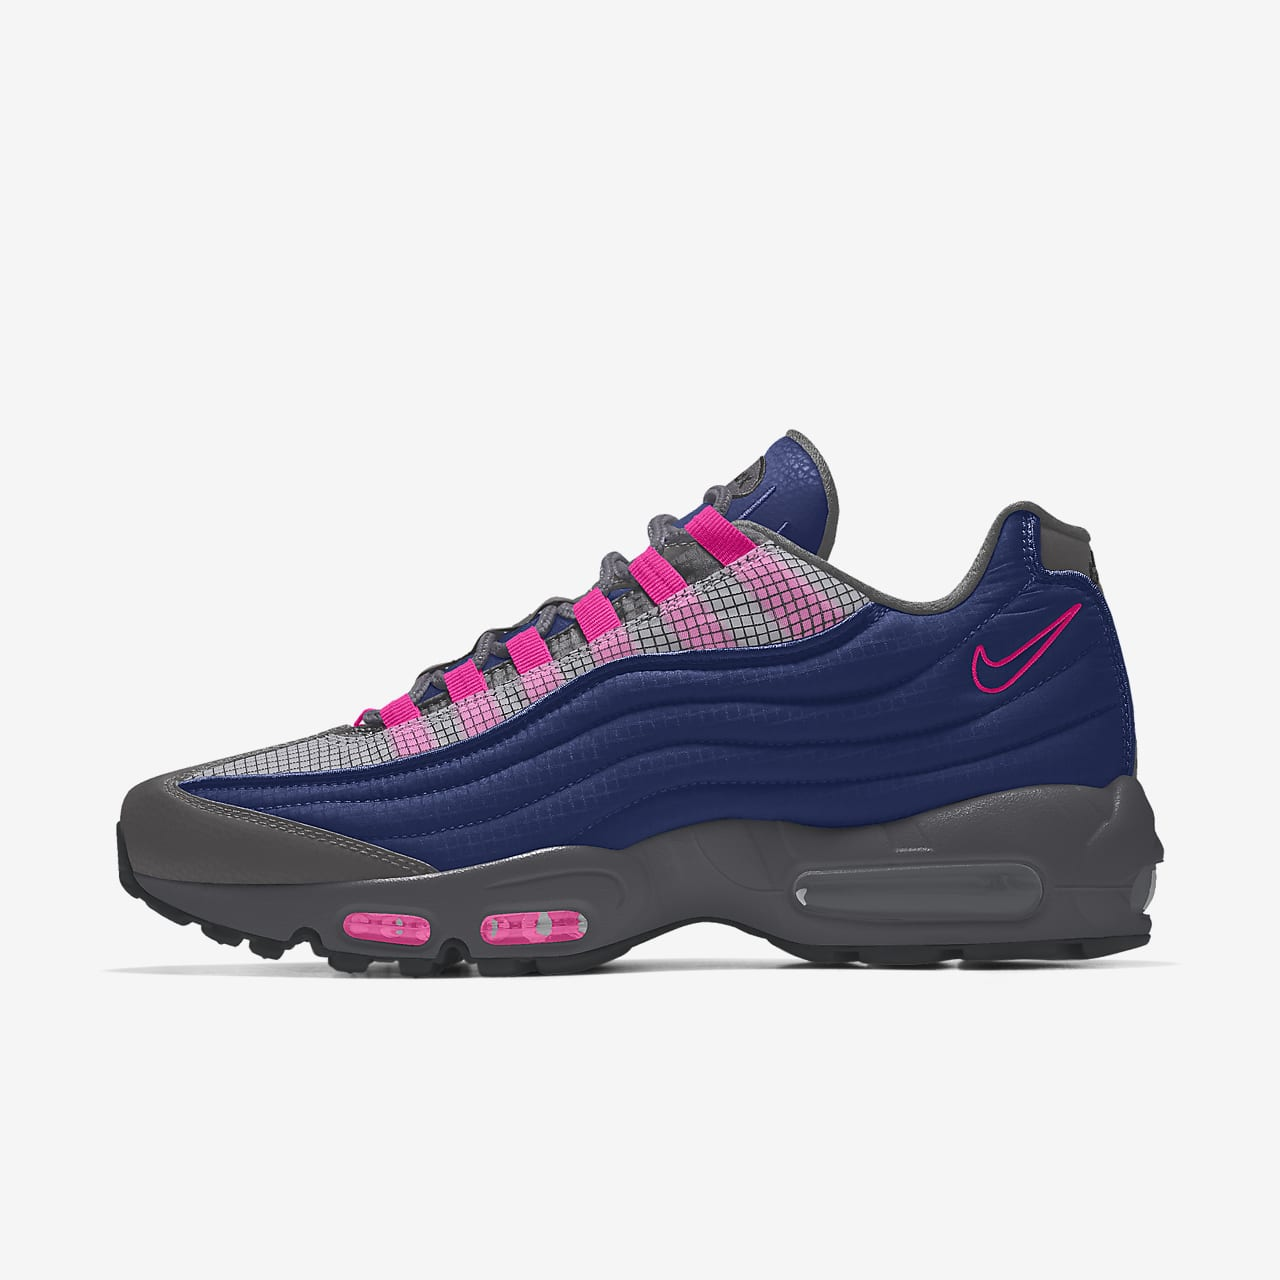 Nike Air Max 95 3M™ By You Custom Shoe